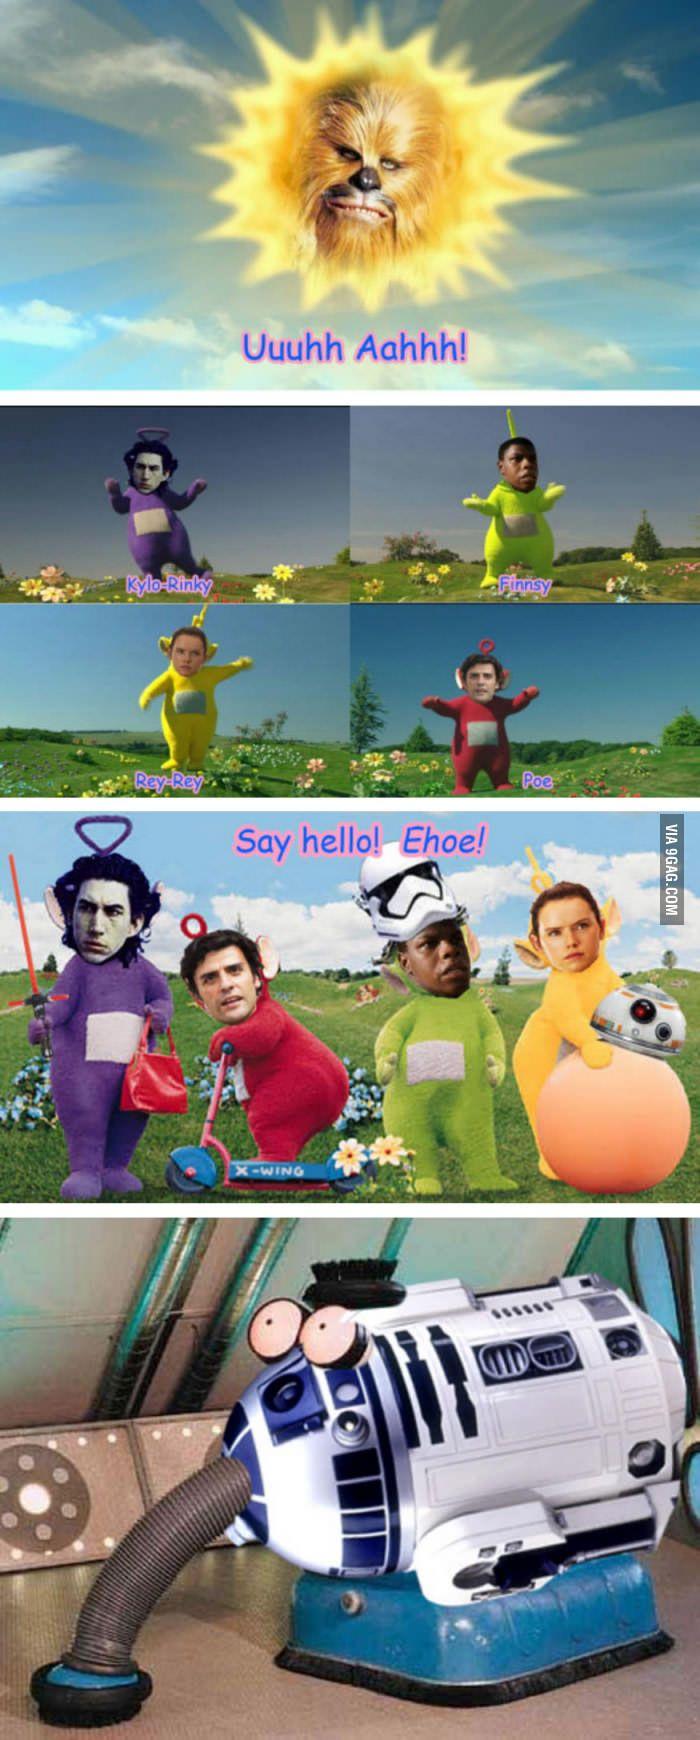 Star Wars characters as teletubbies soooo funny ;)